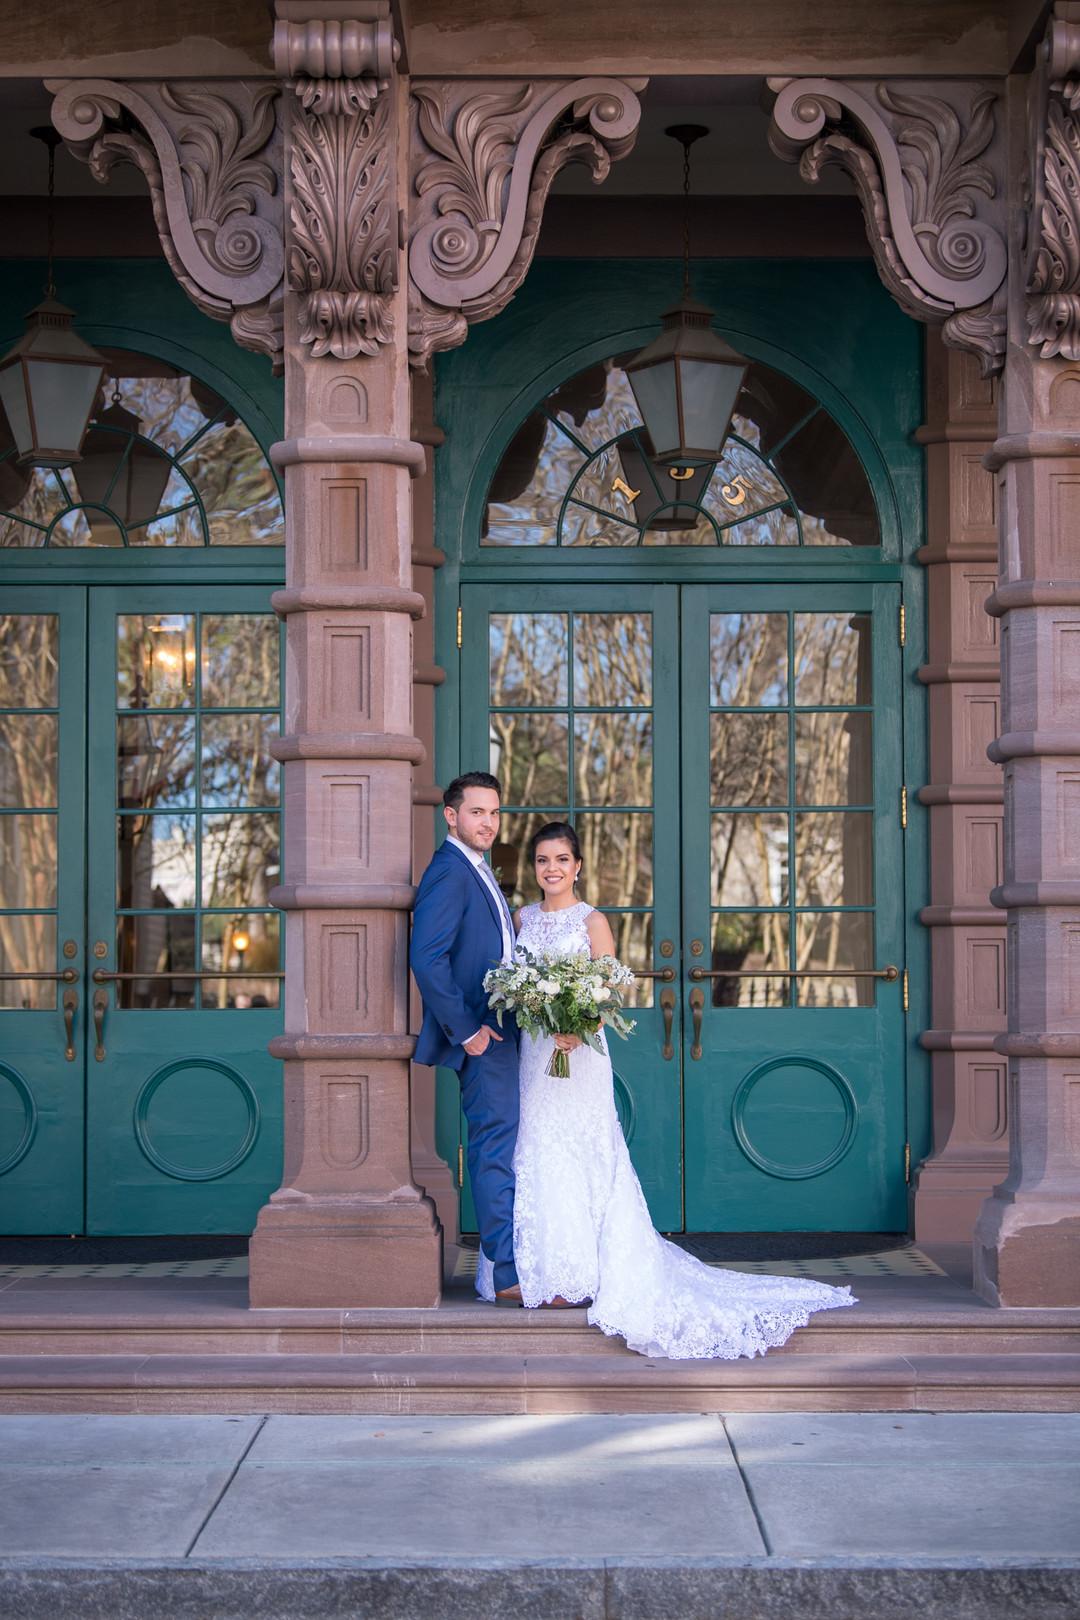 cannon-green-wedding-8(1).jpg